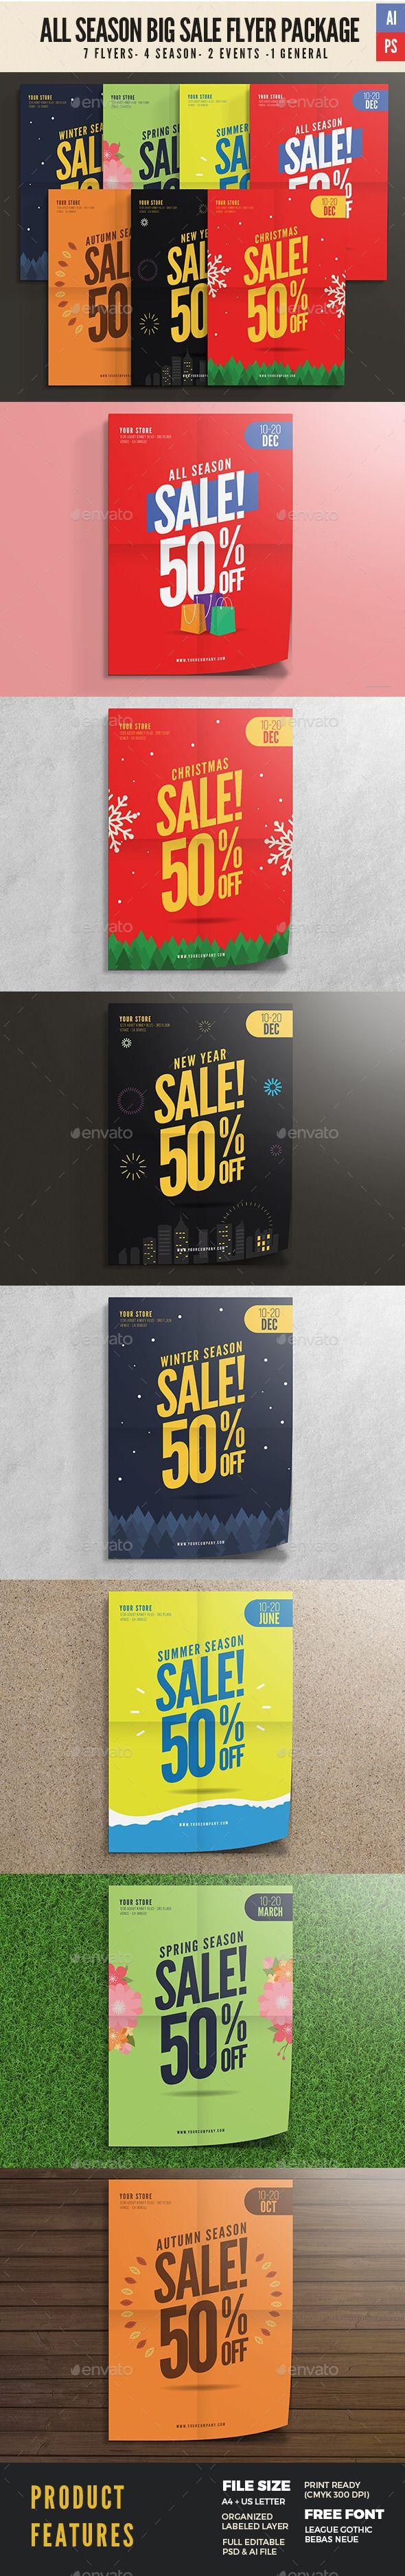 All season big sale flyer package sale postersale signageai illustratorfashion eventsbanner designflyer